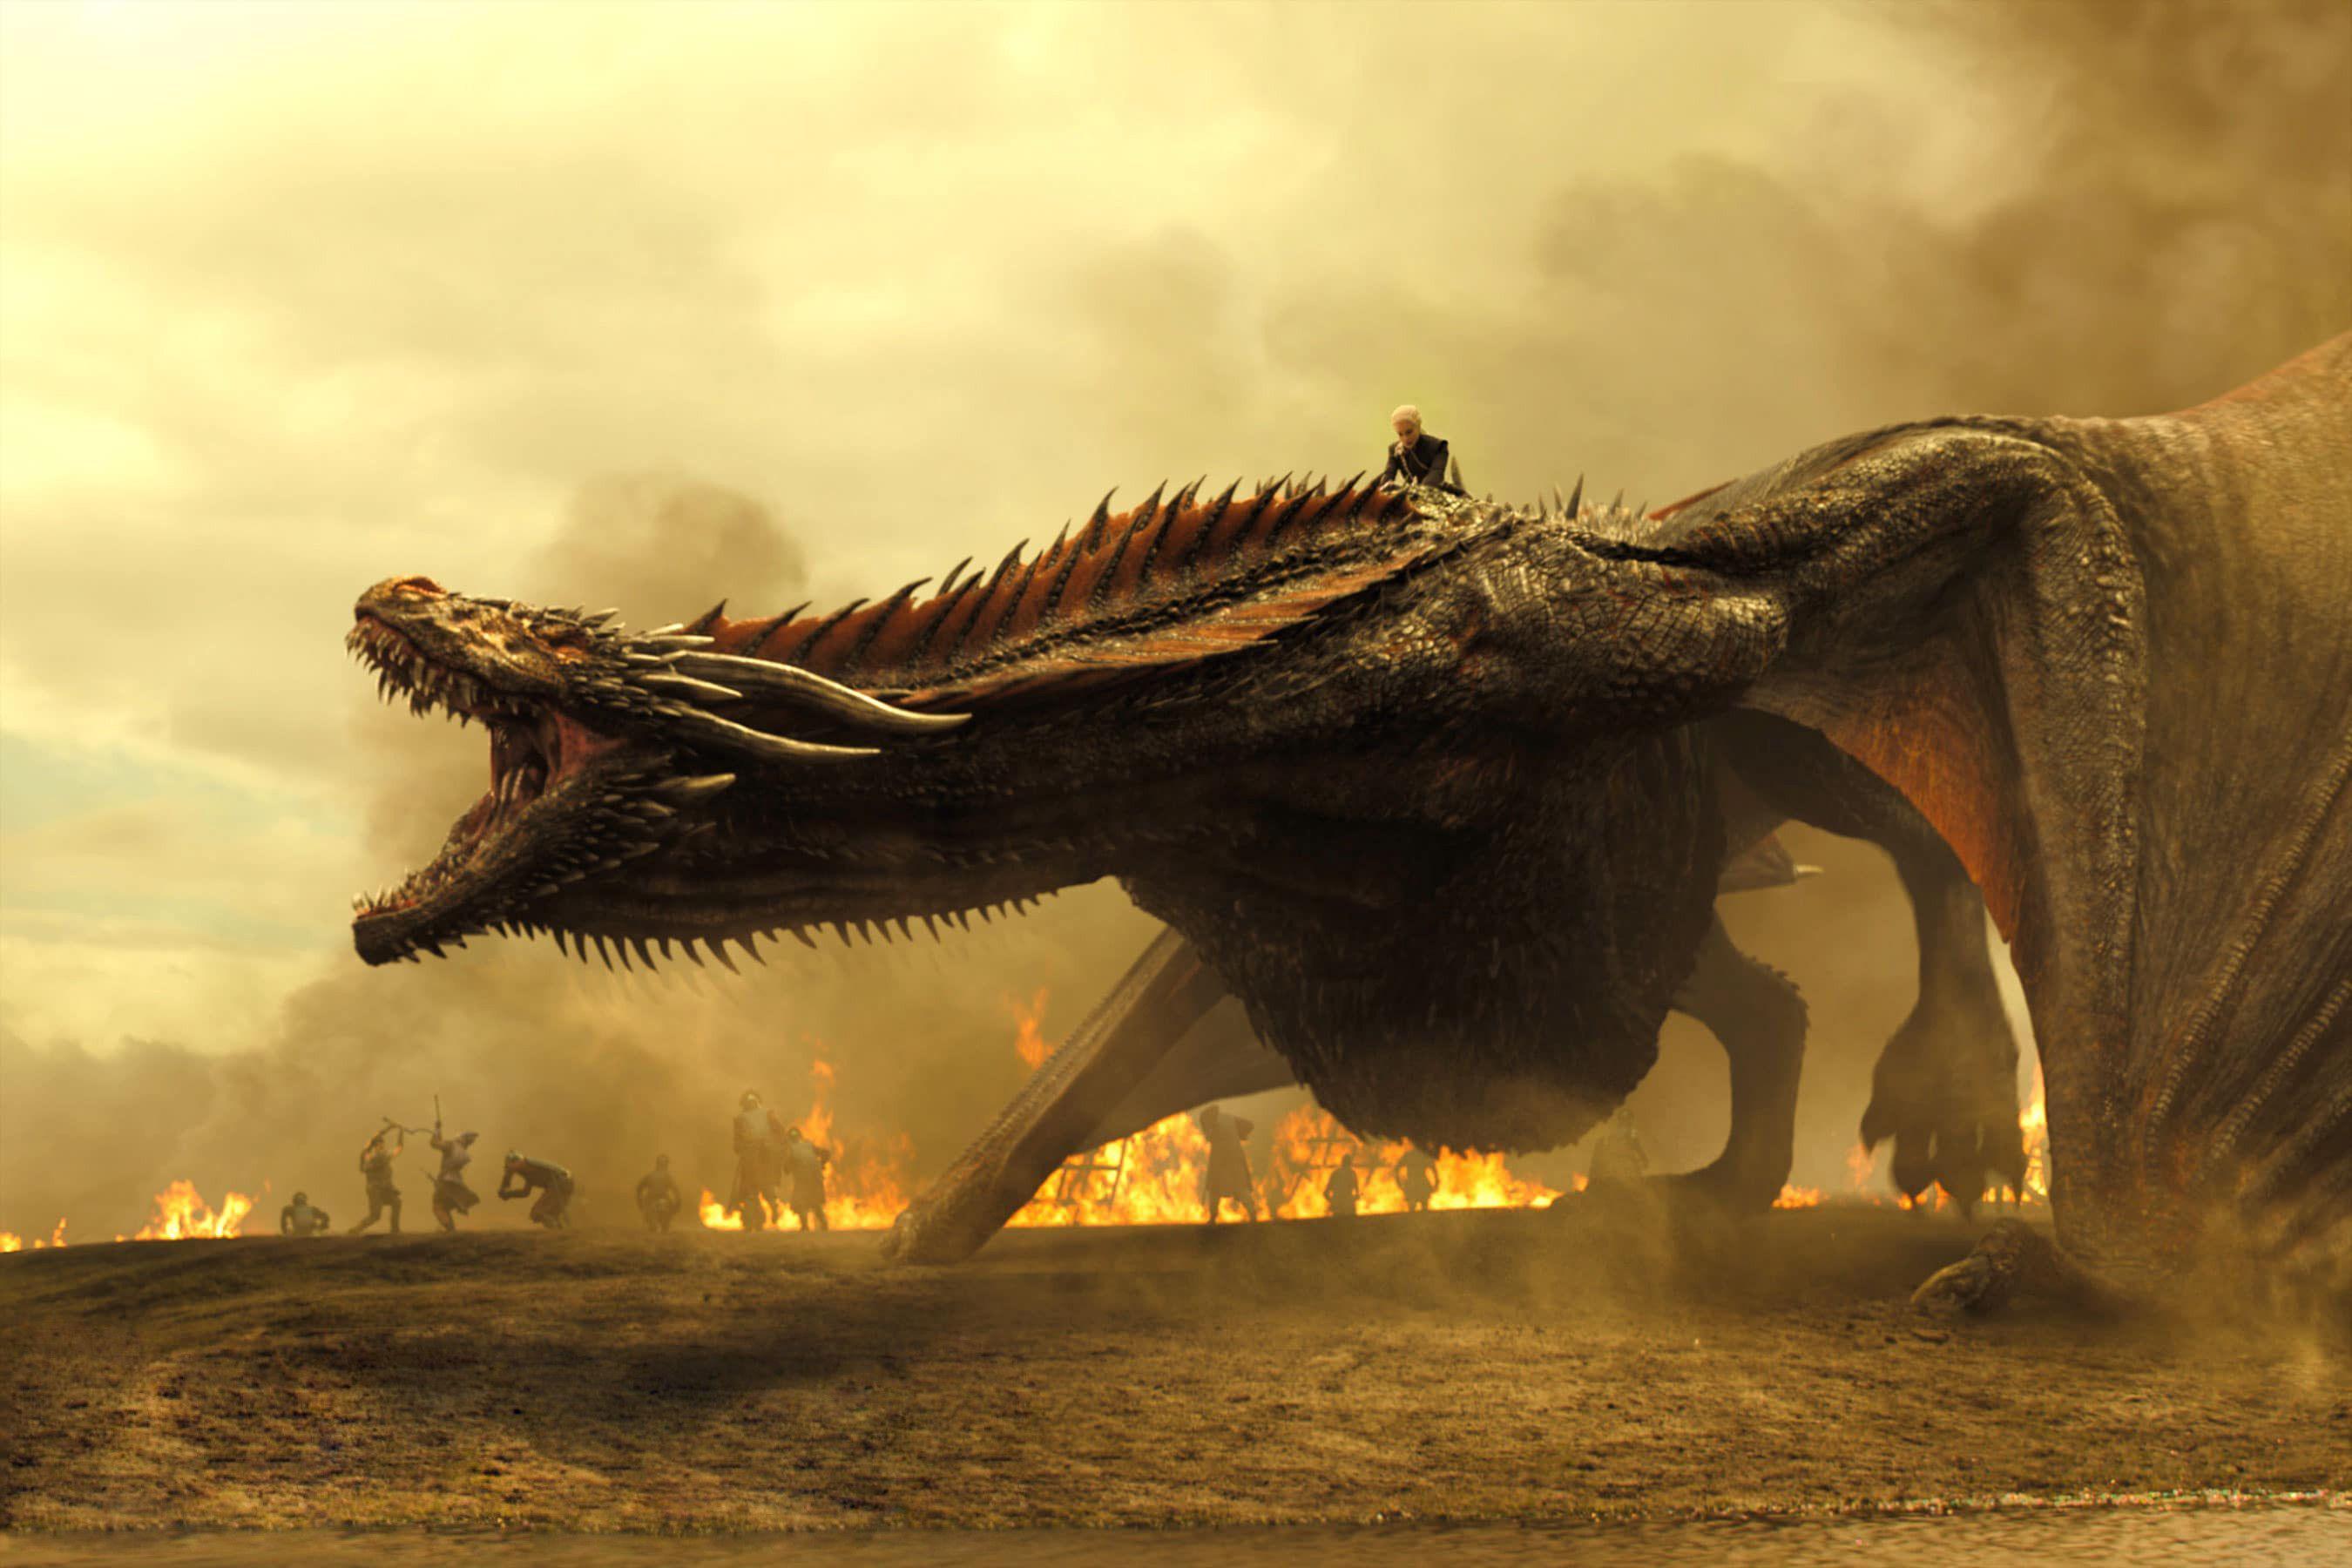 Game Of Thrones Season 7 Dragon And Khaleesi, HD Tv Shows, 4k .